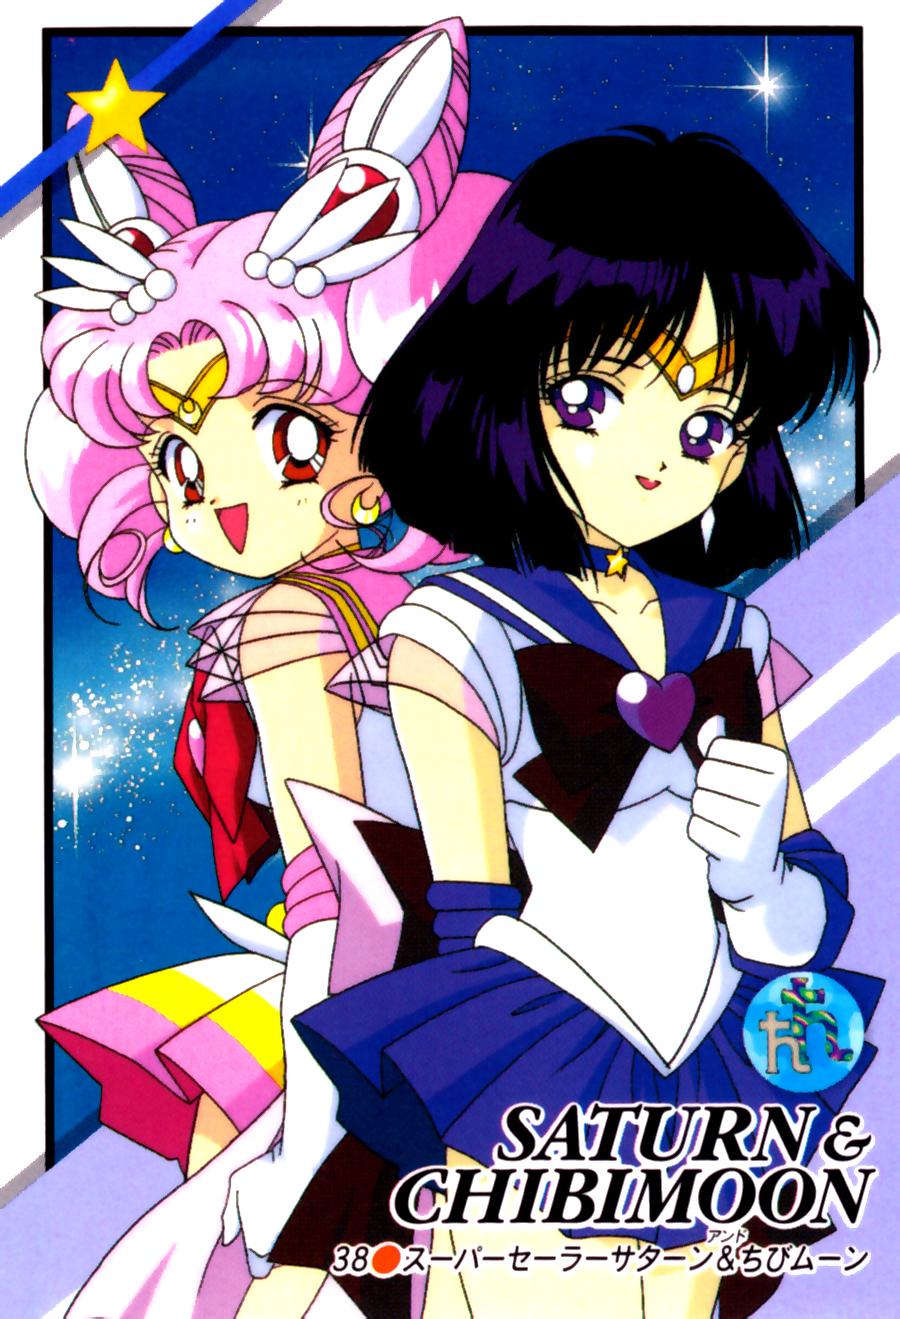 Sailor chibi Moon and Saturn